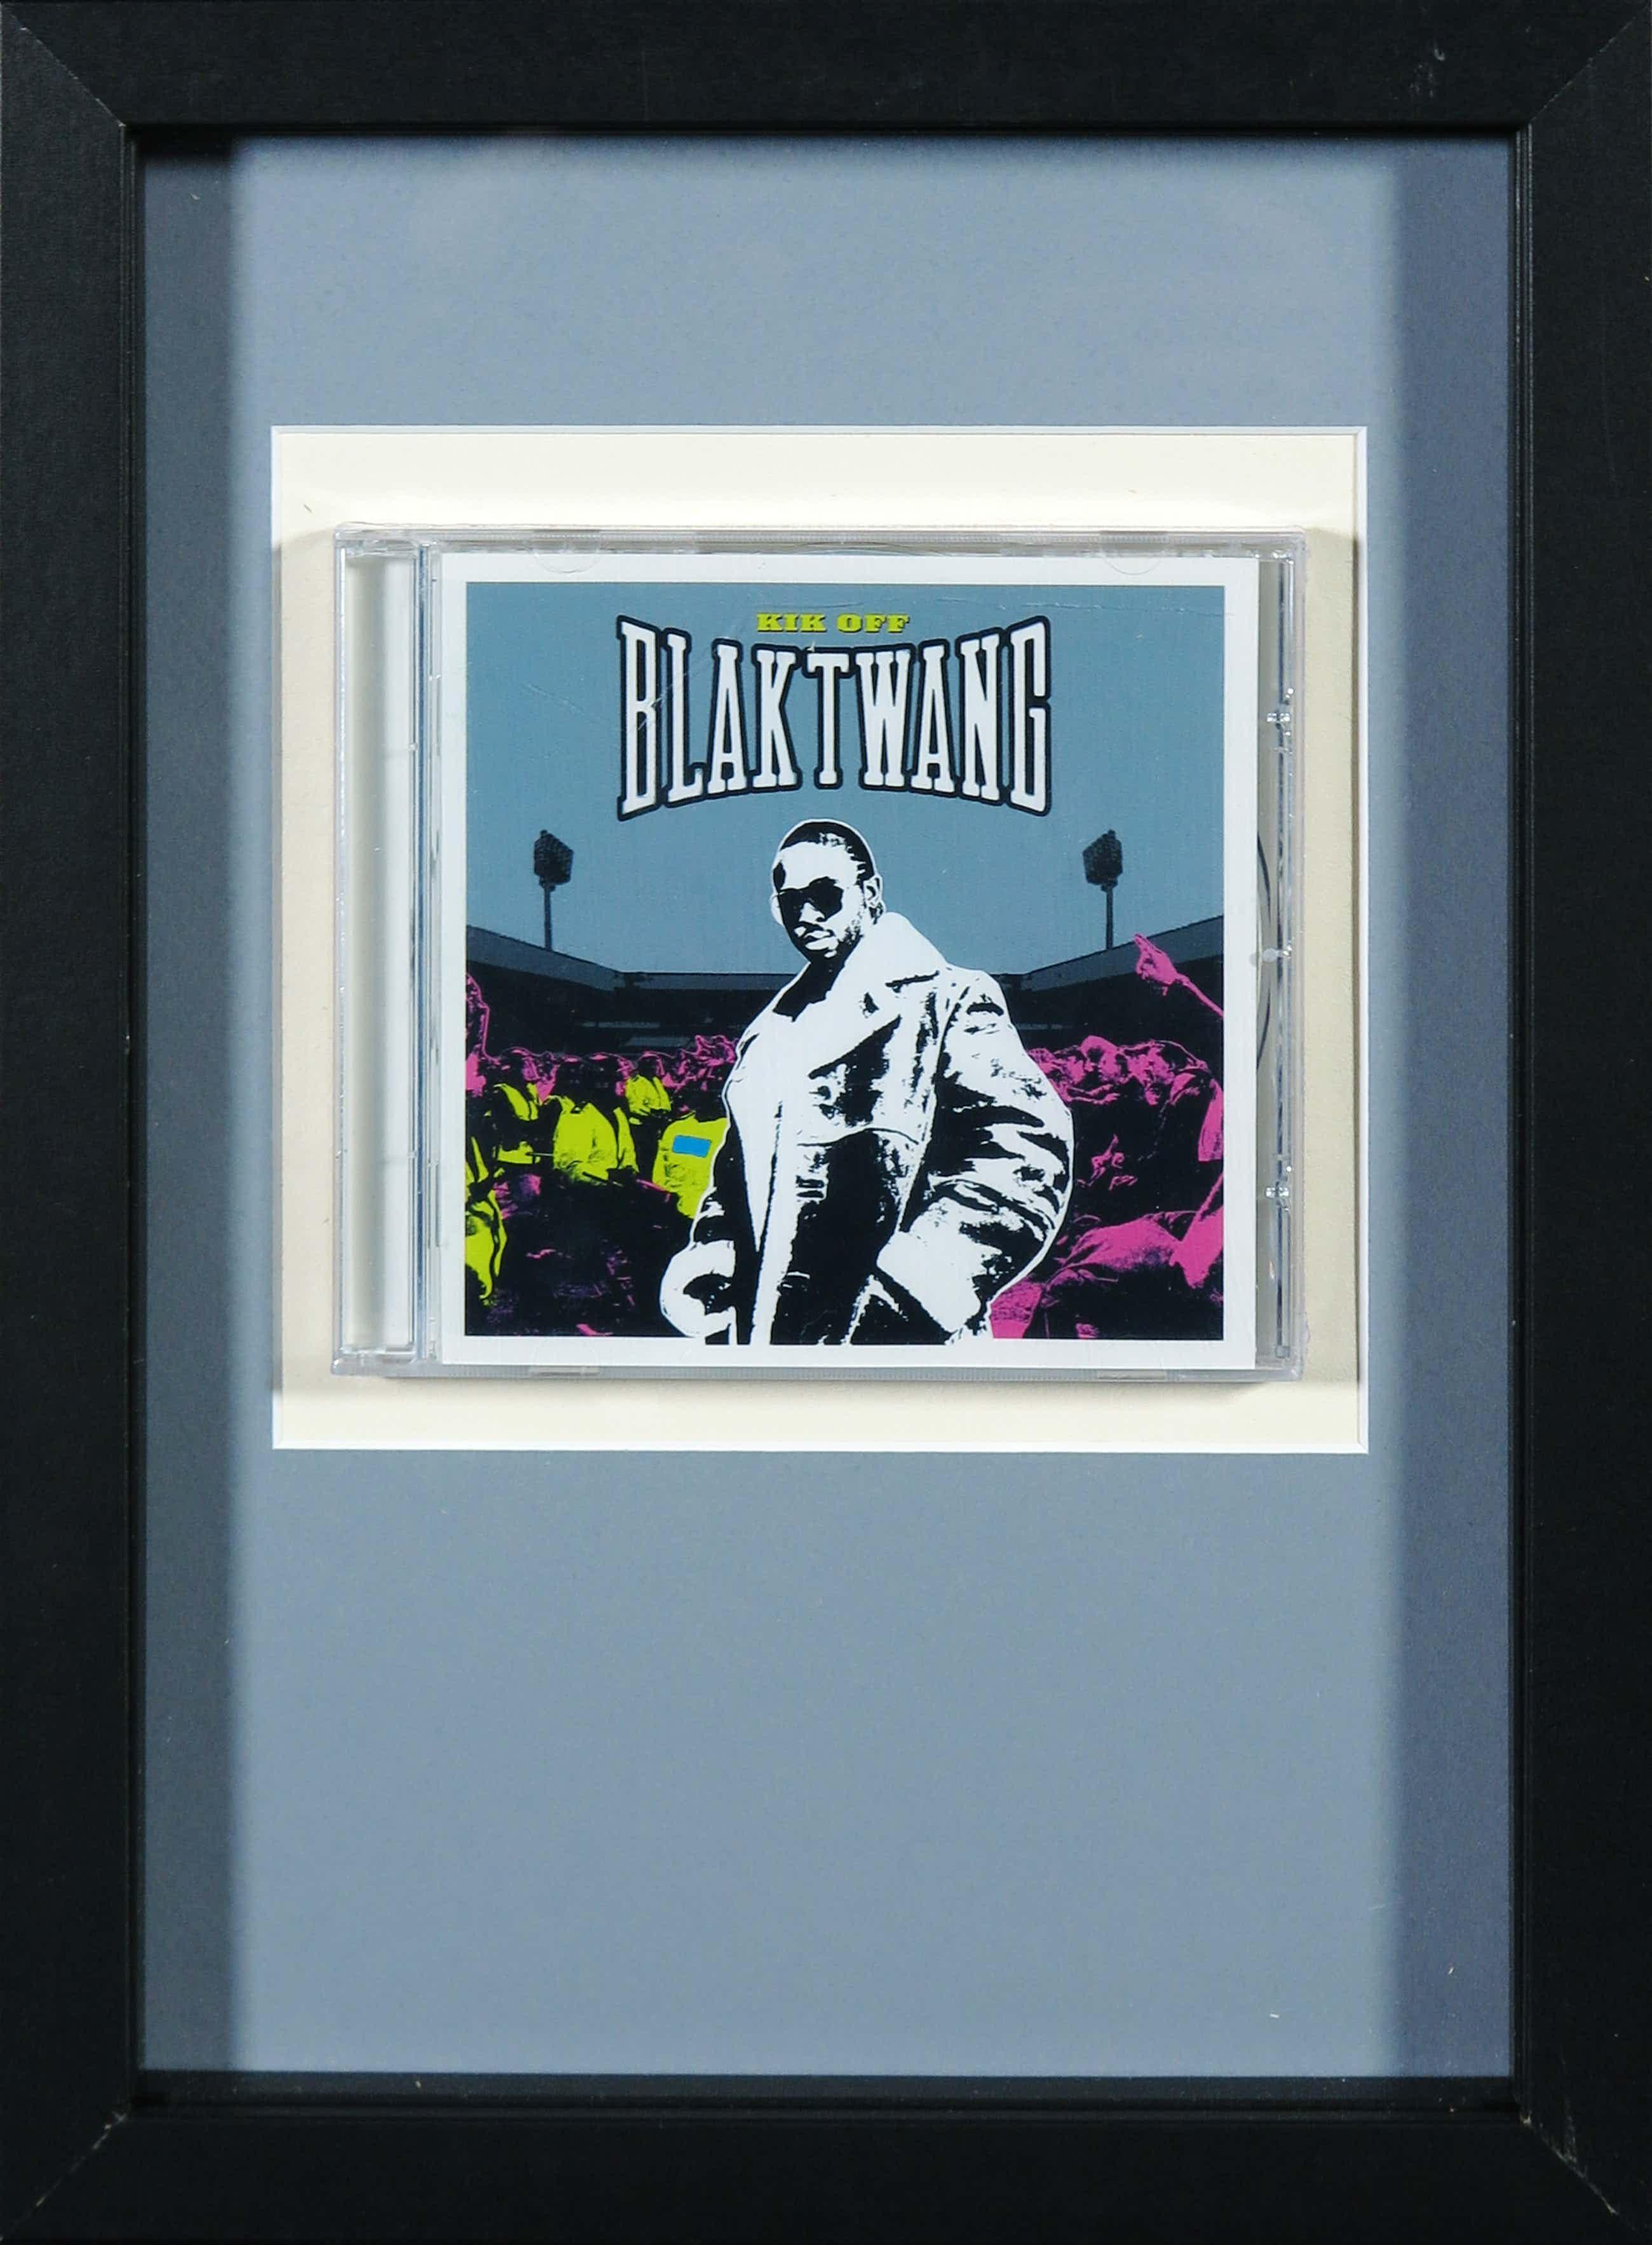 Banksy - Blak Twang - Kik Off (CD) kopen? Bied vanaf 40!